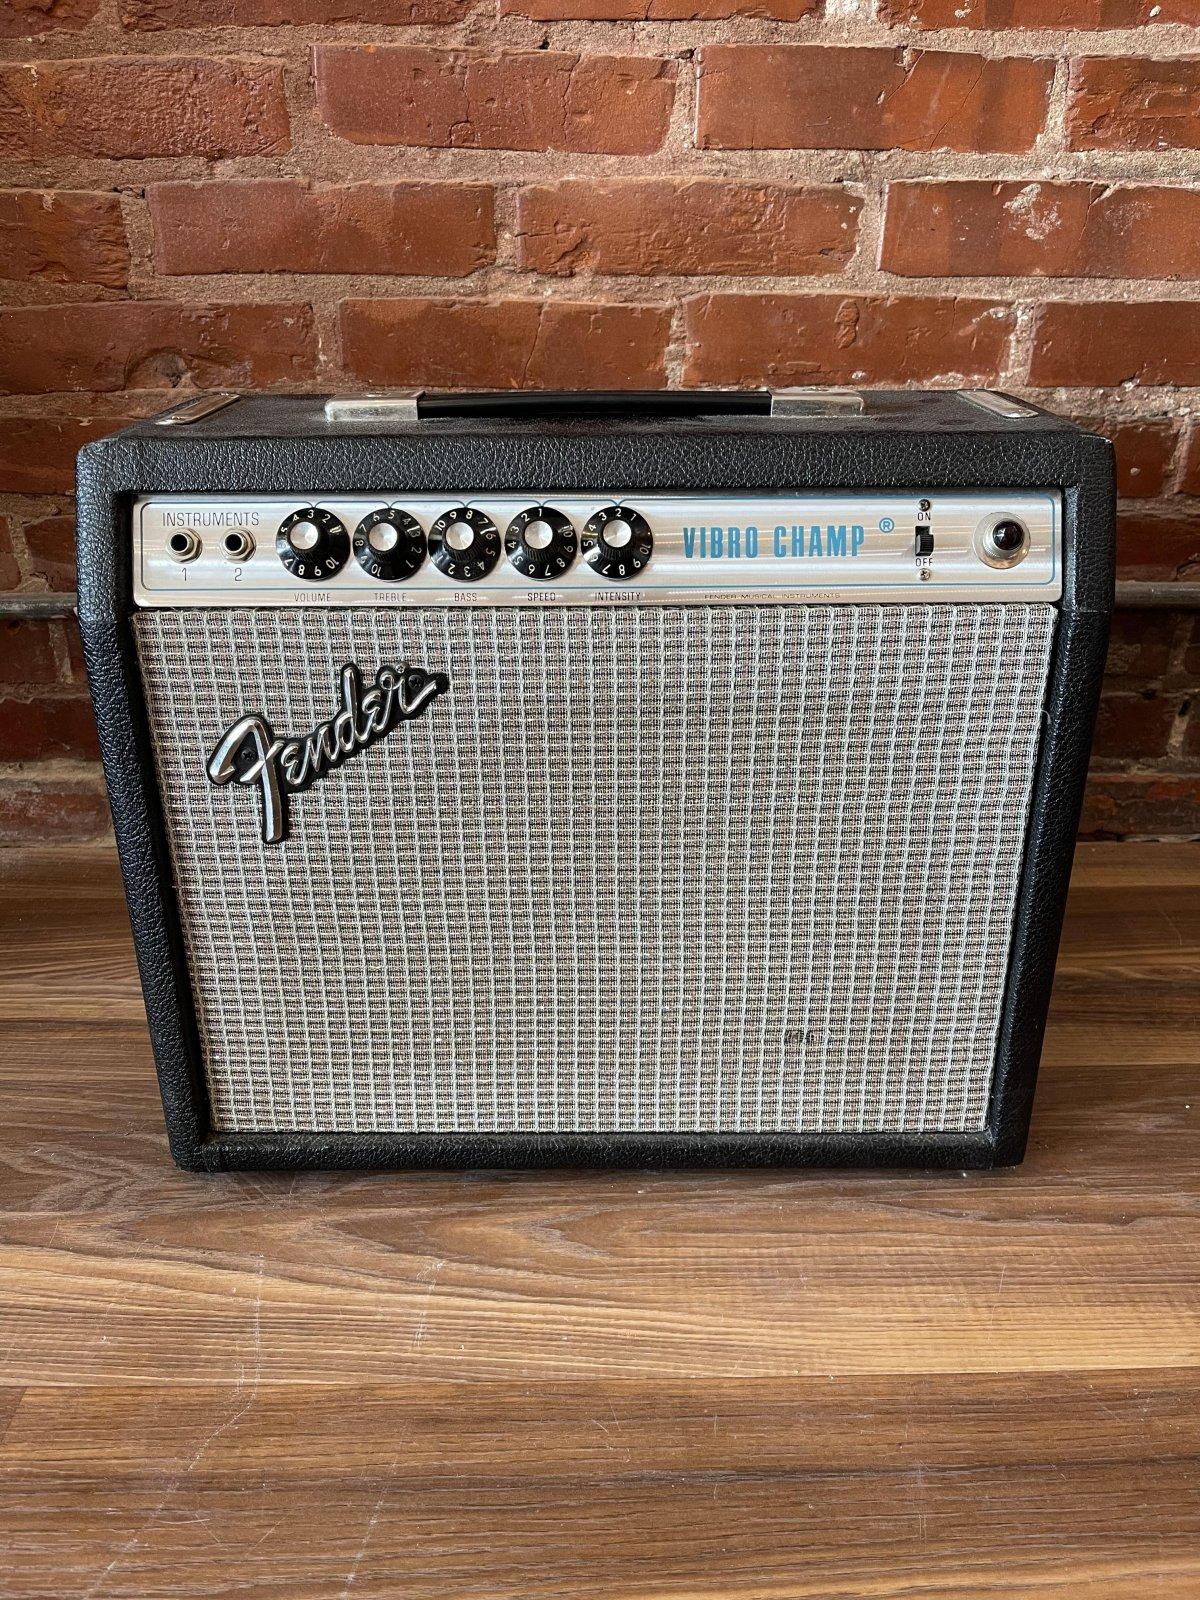 1977 Fender Vibro Champ Silverface Amplifier